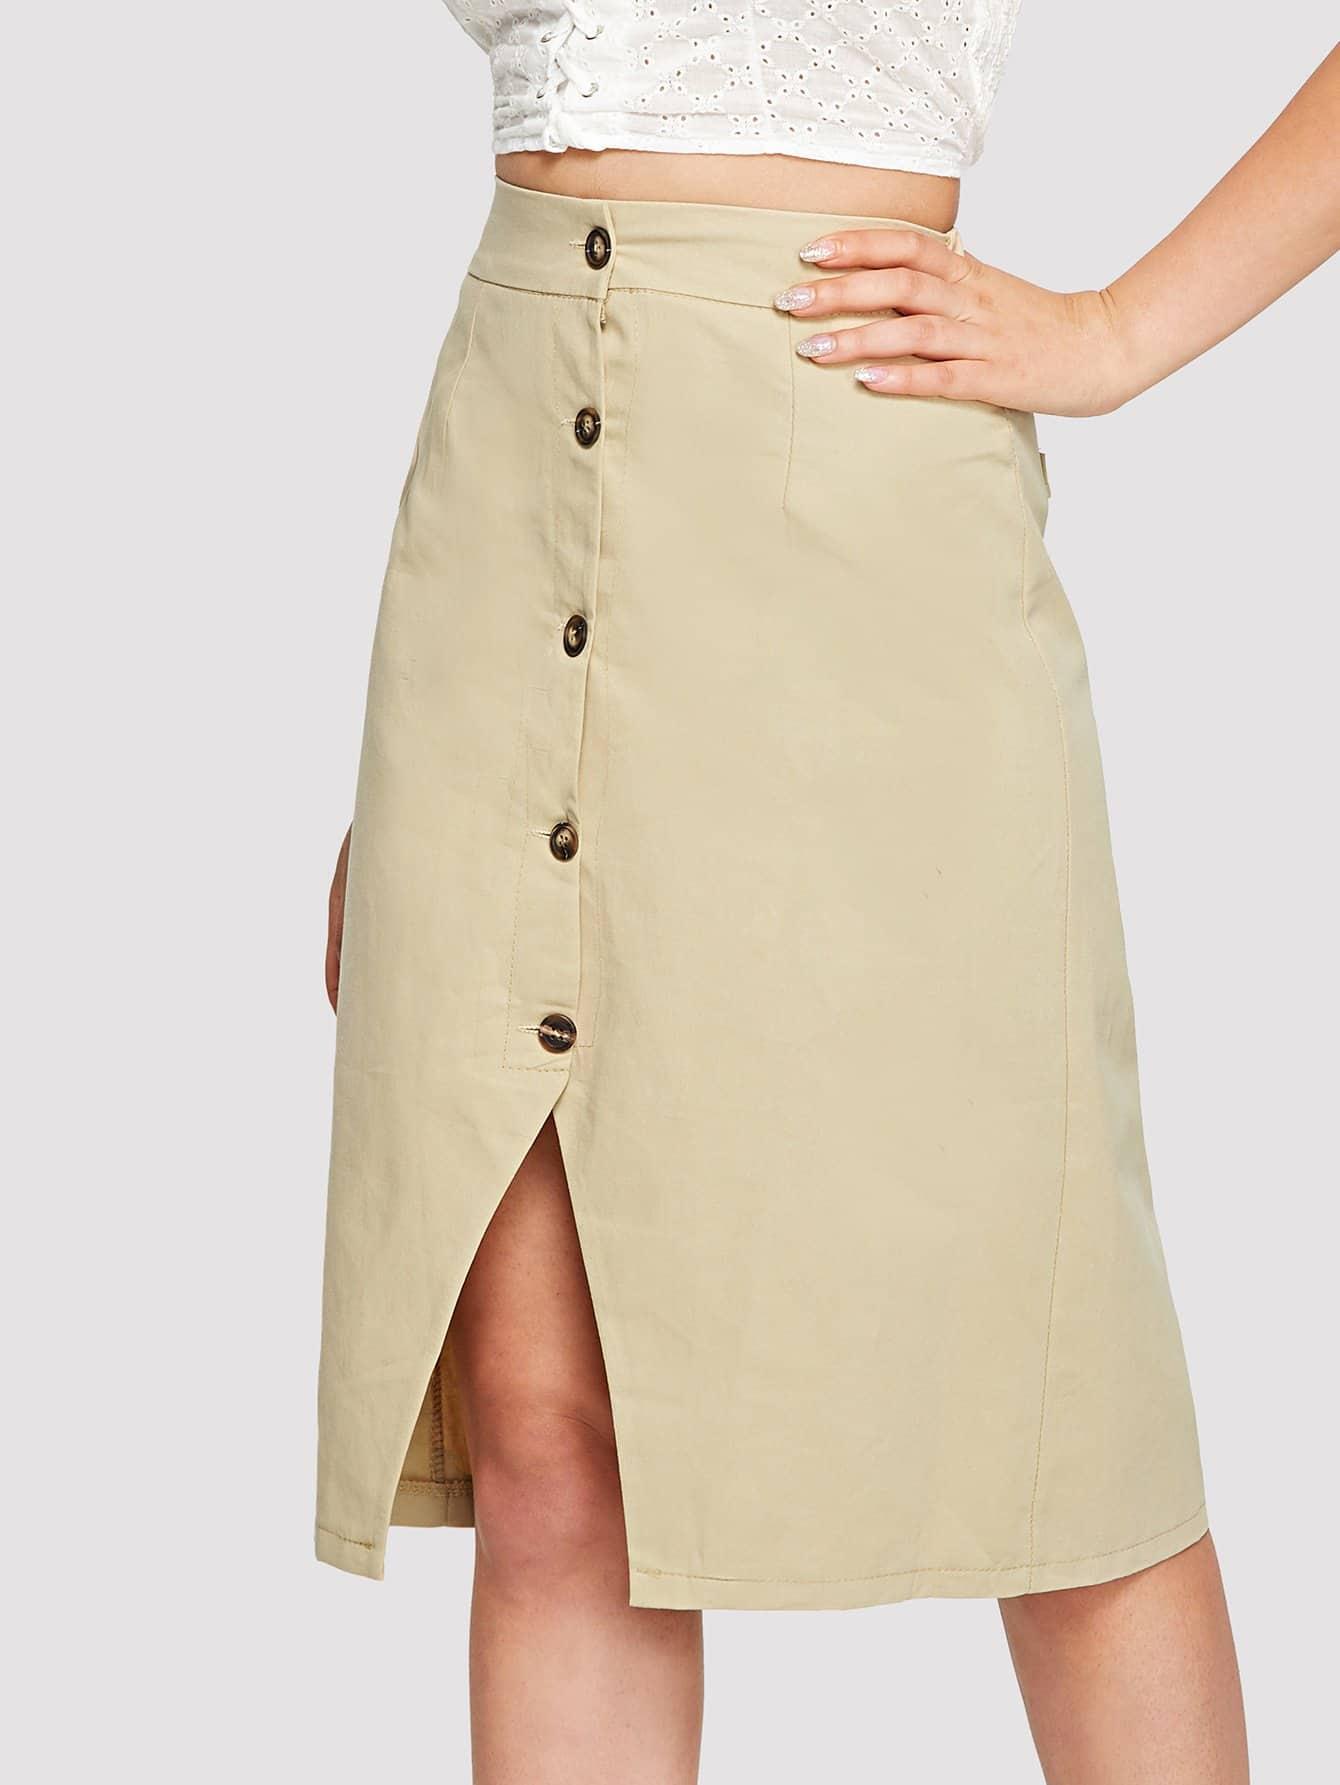 Button Front Split Denim Skirt button front denim suspender skirt